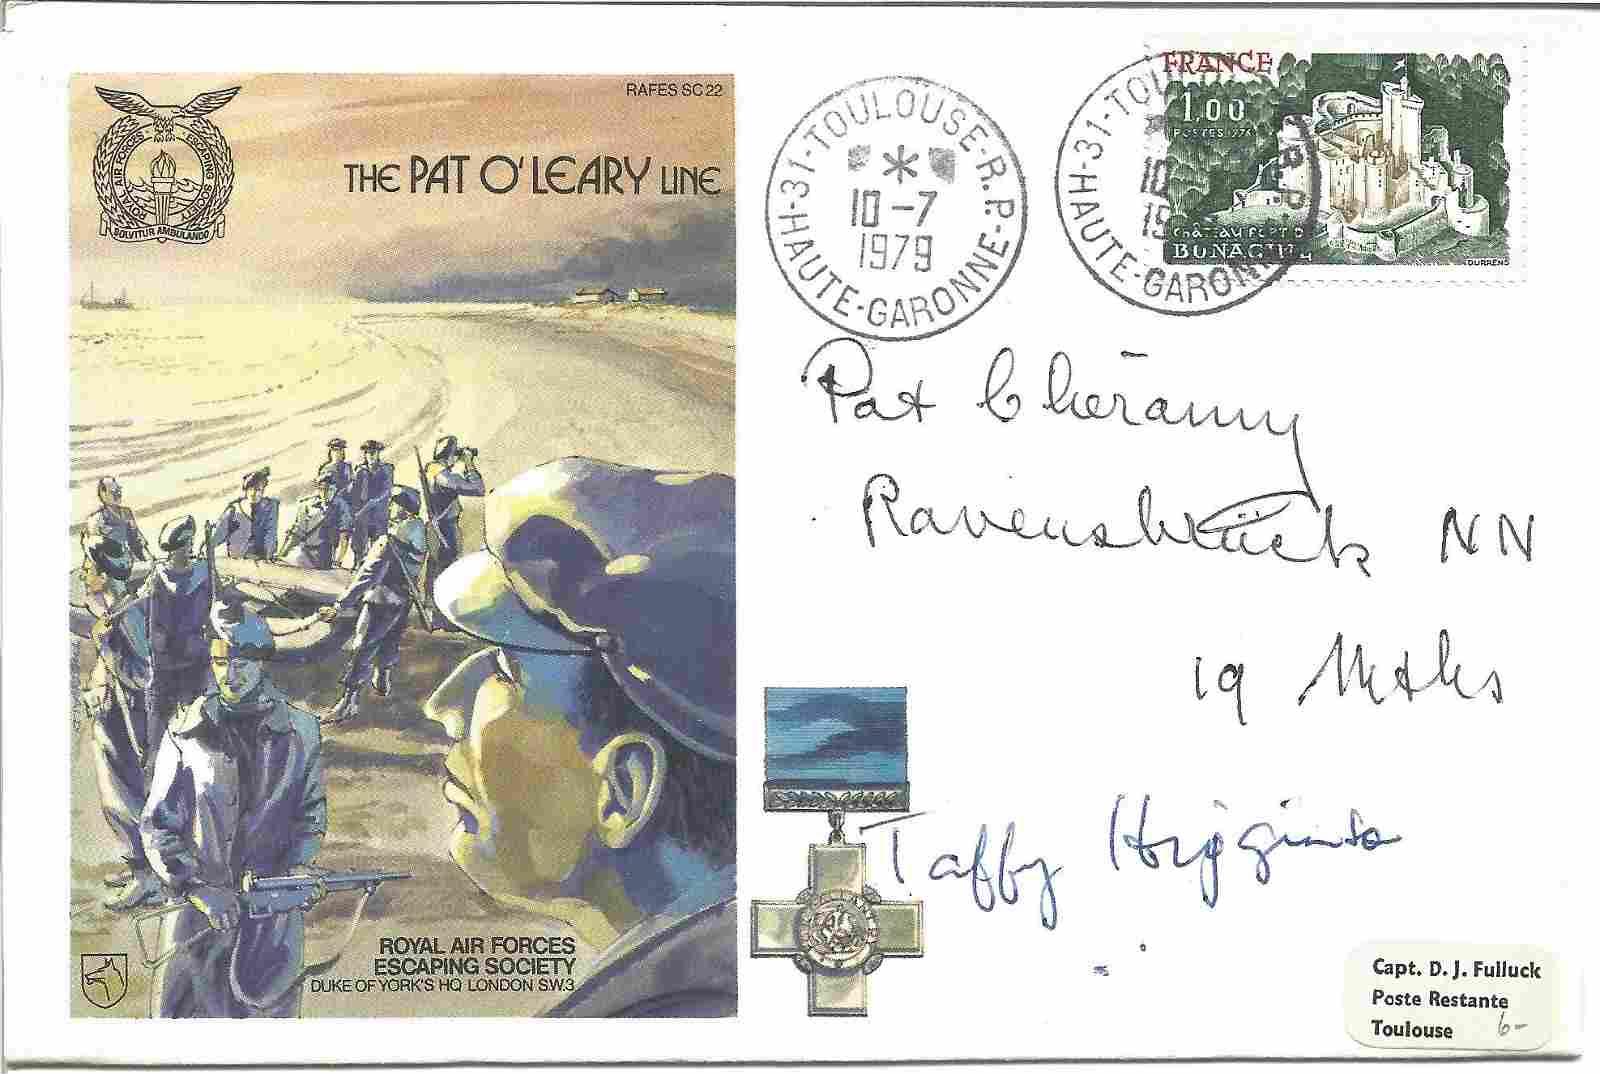 Taffy Higginson DFC WW2 ace and Pat Cheramy Resistance